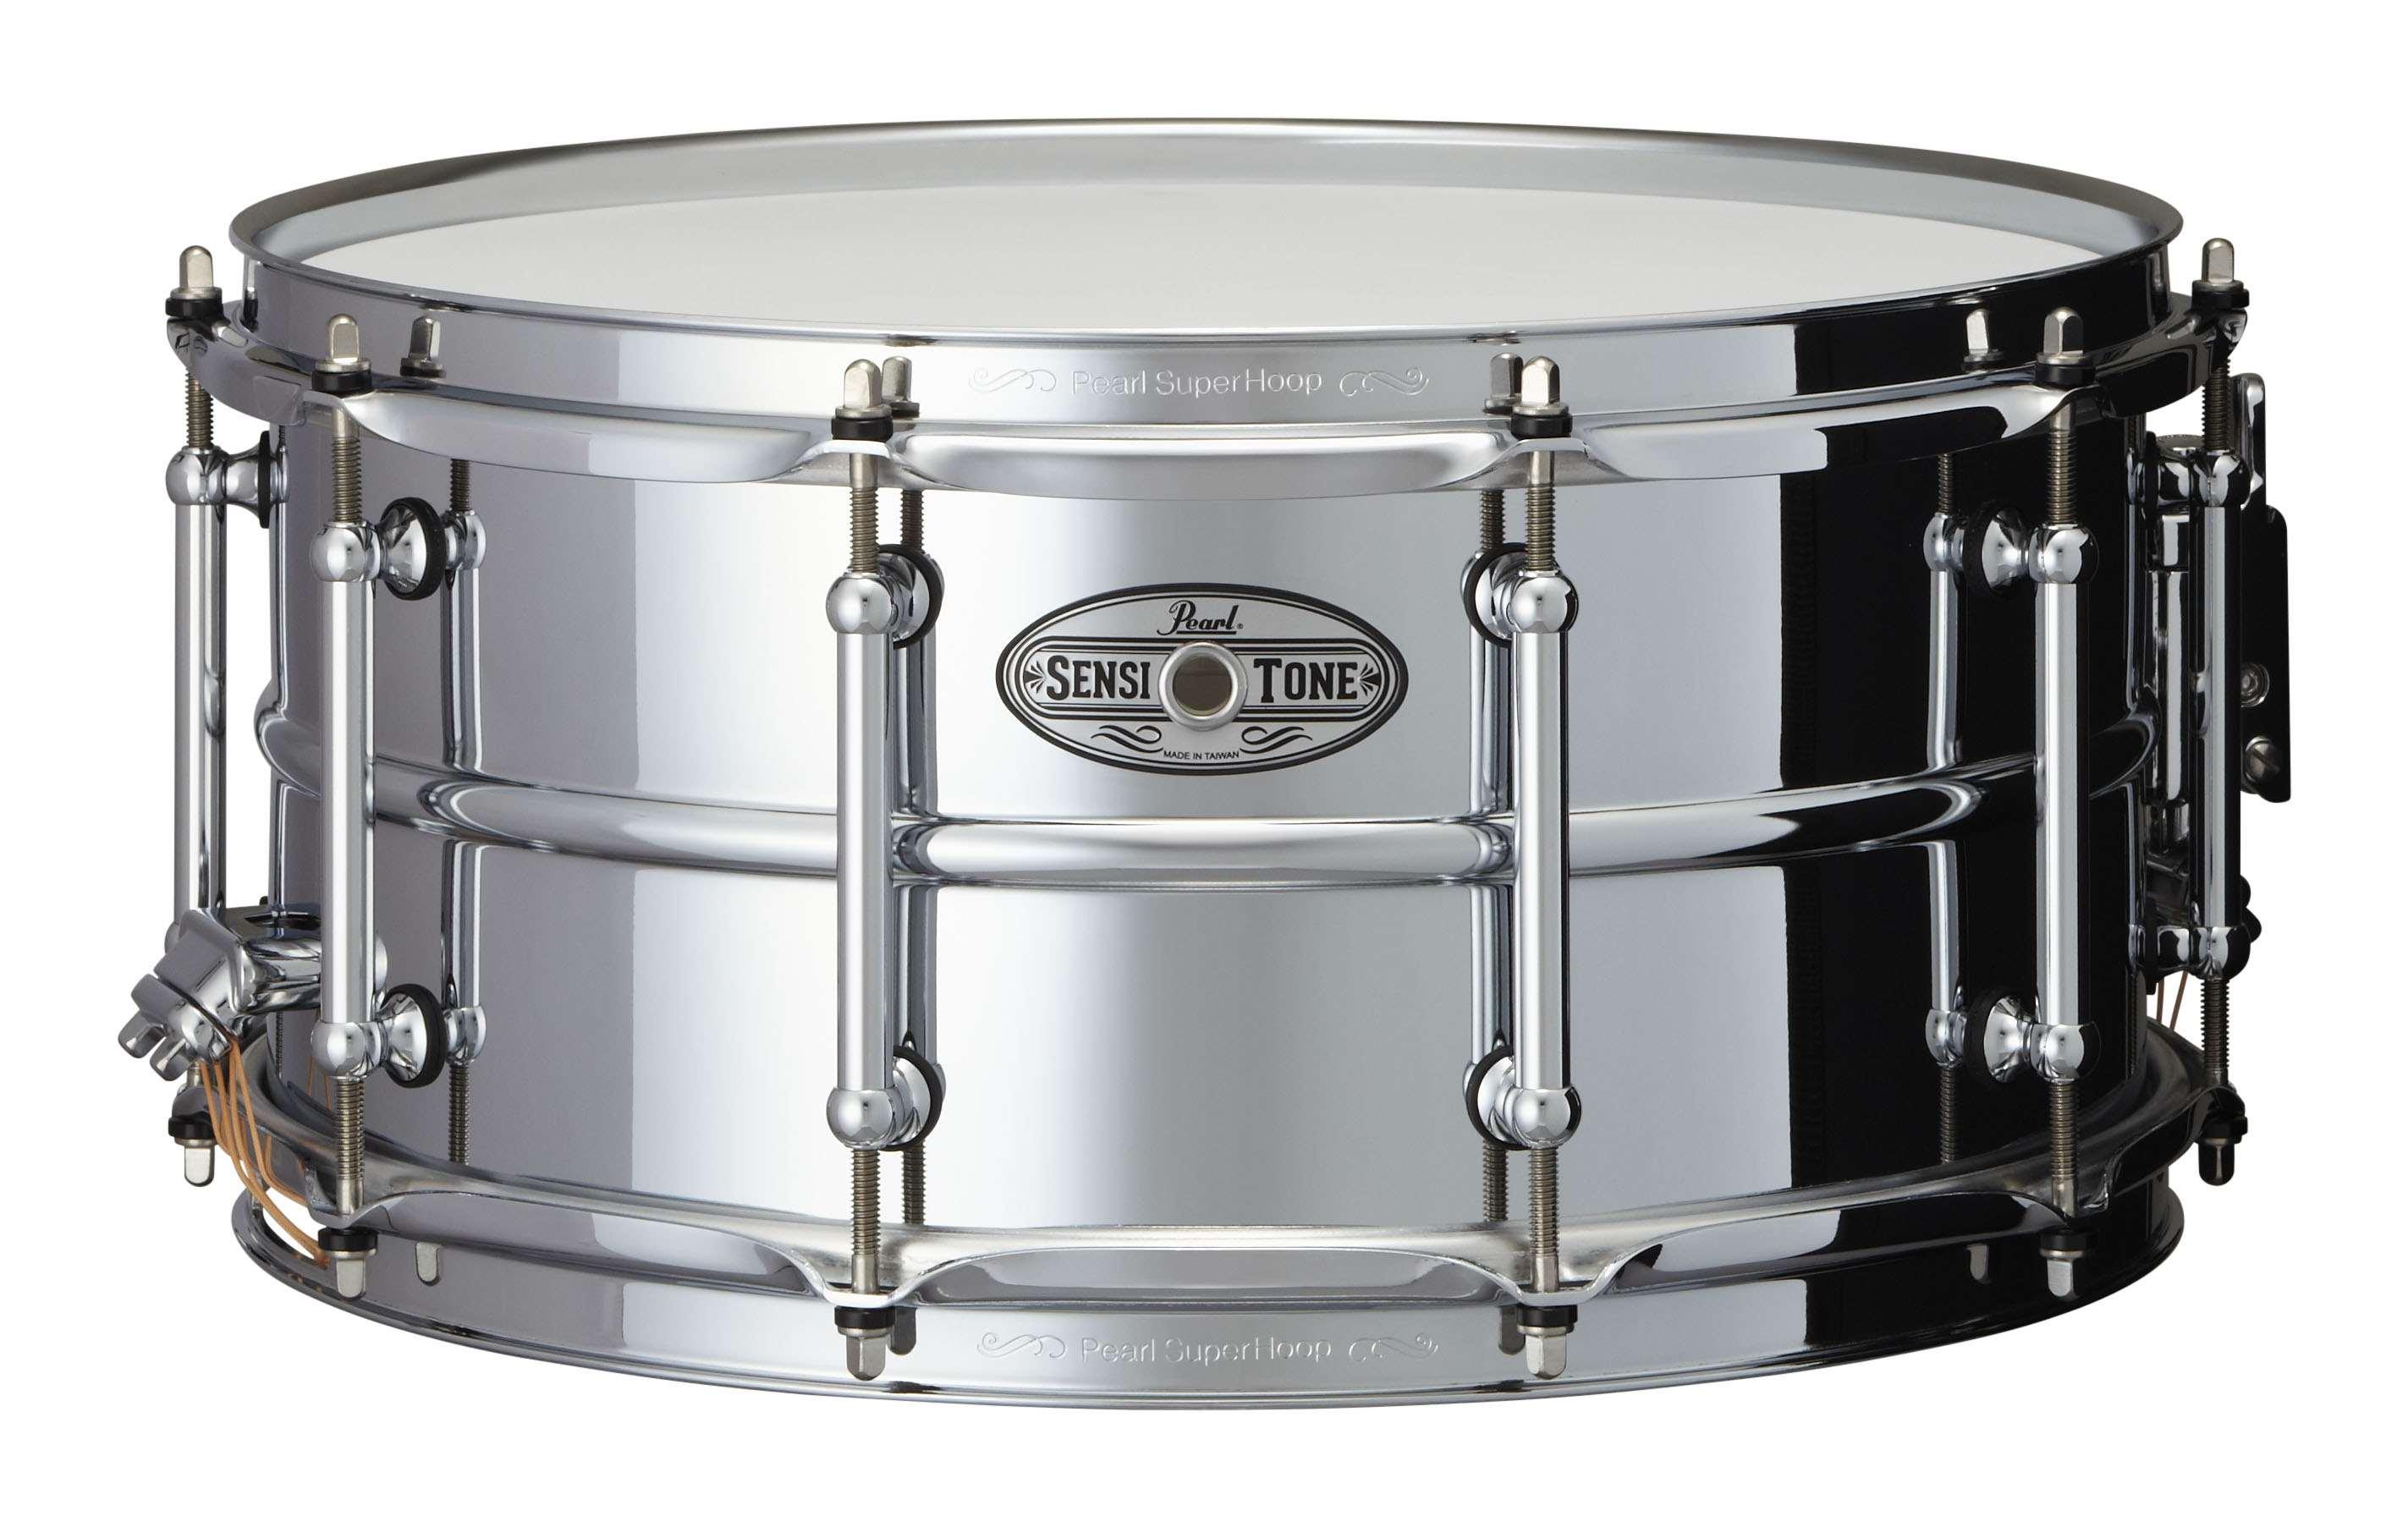 Pearl Sensitone 14x6.5 Inch Snare - Beaded Steel - Long & McQuade ...